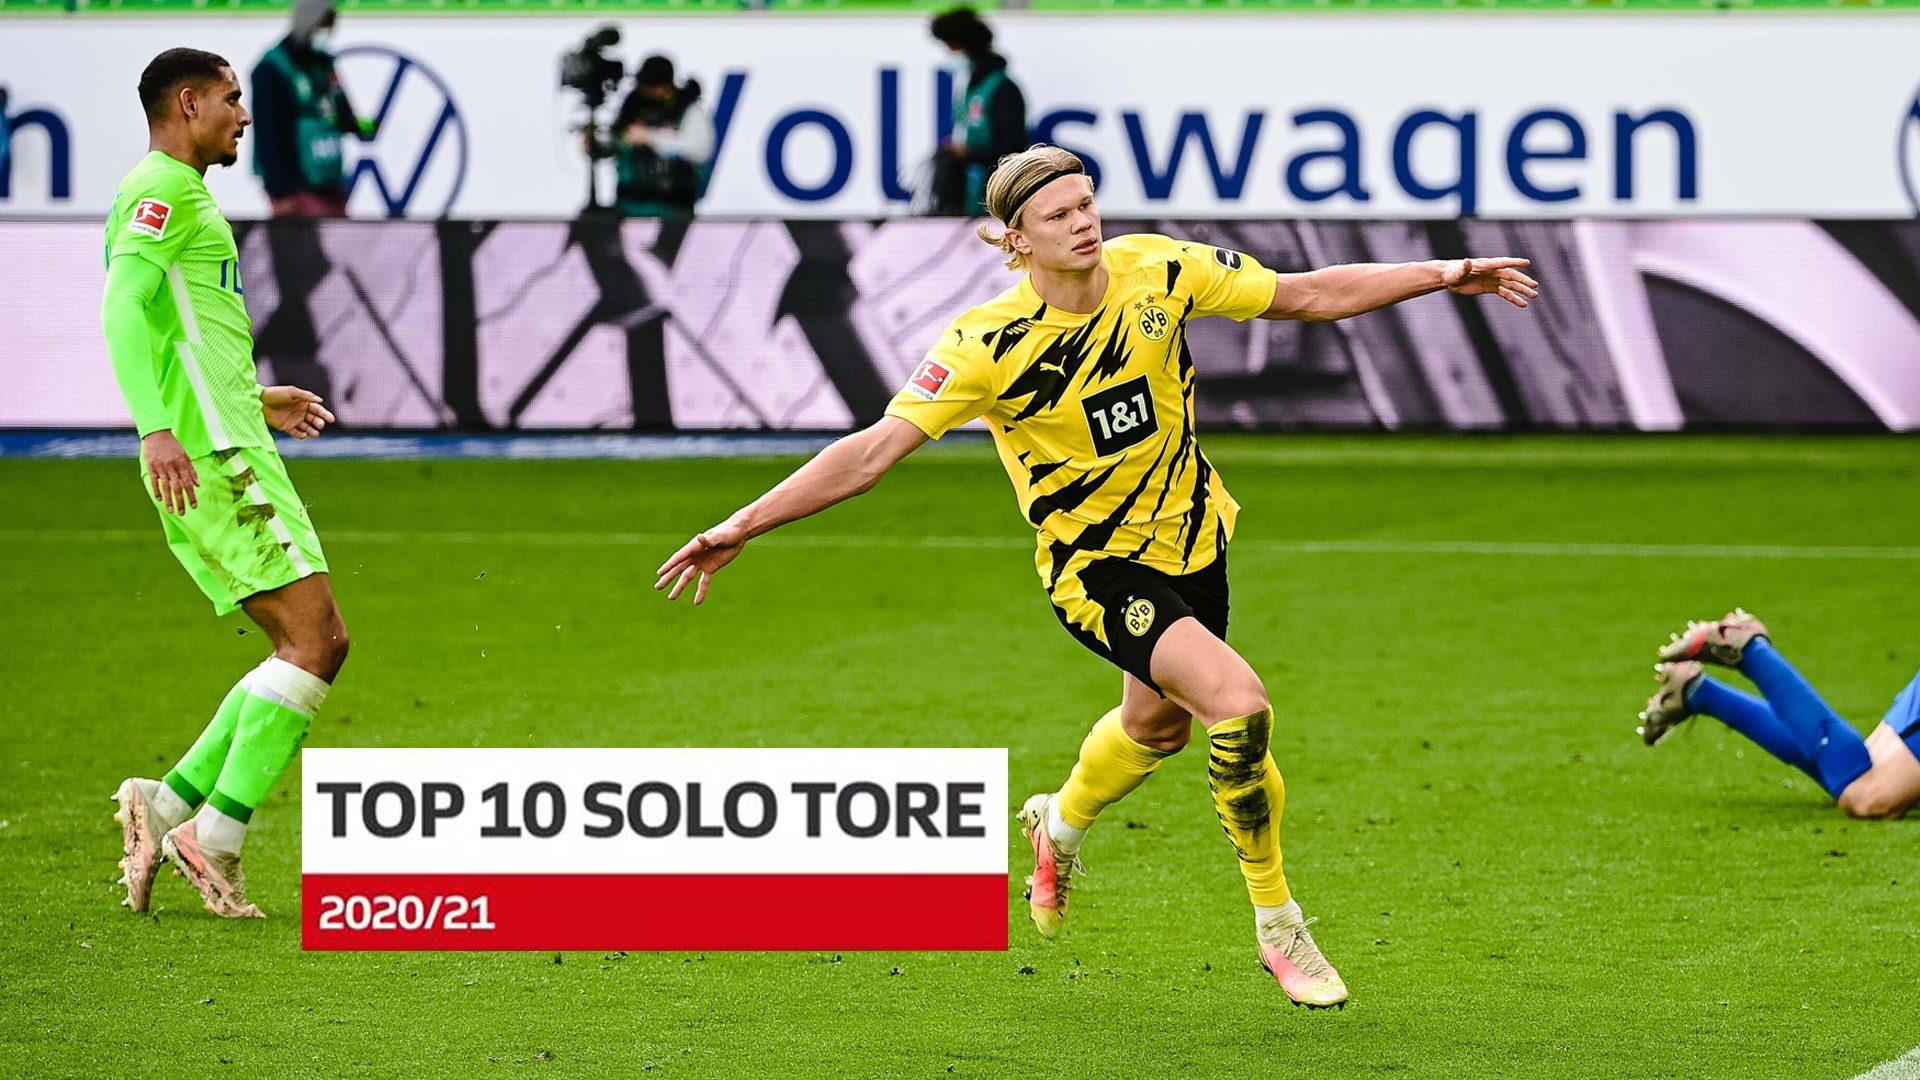 Video: Die zehn besten Solo-Treffer 2020/21